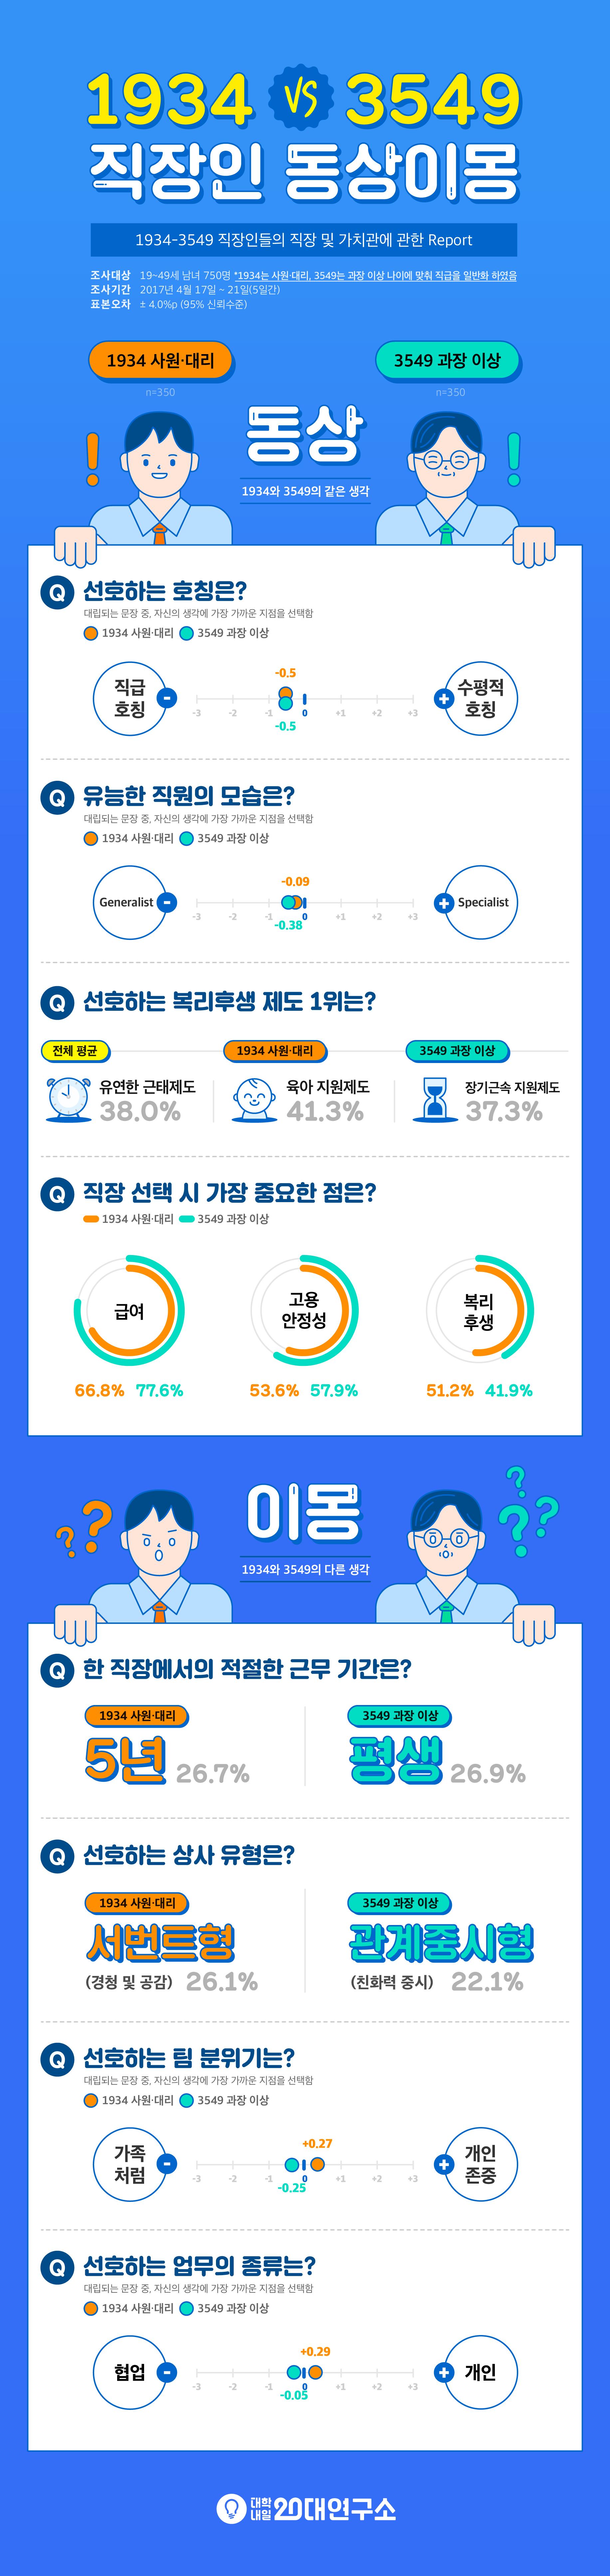 1949%e1%84%83%e1%85%a9%e1%86%bc%e1%84%89%e1%85%a1%e1%86%bc%e1%84%8b%e1%85%b5%e1%84%86%e1%85%a9%e1%86%bc